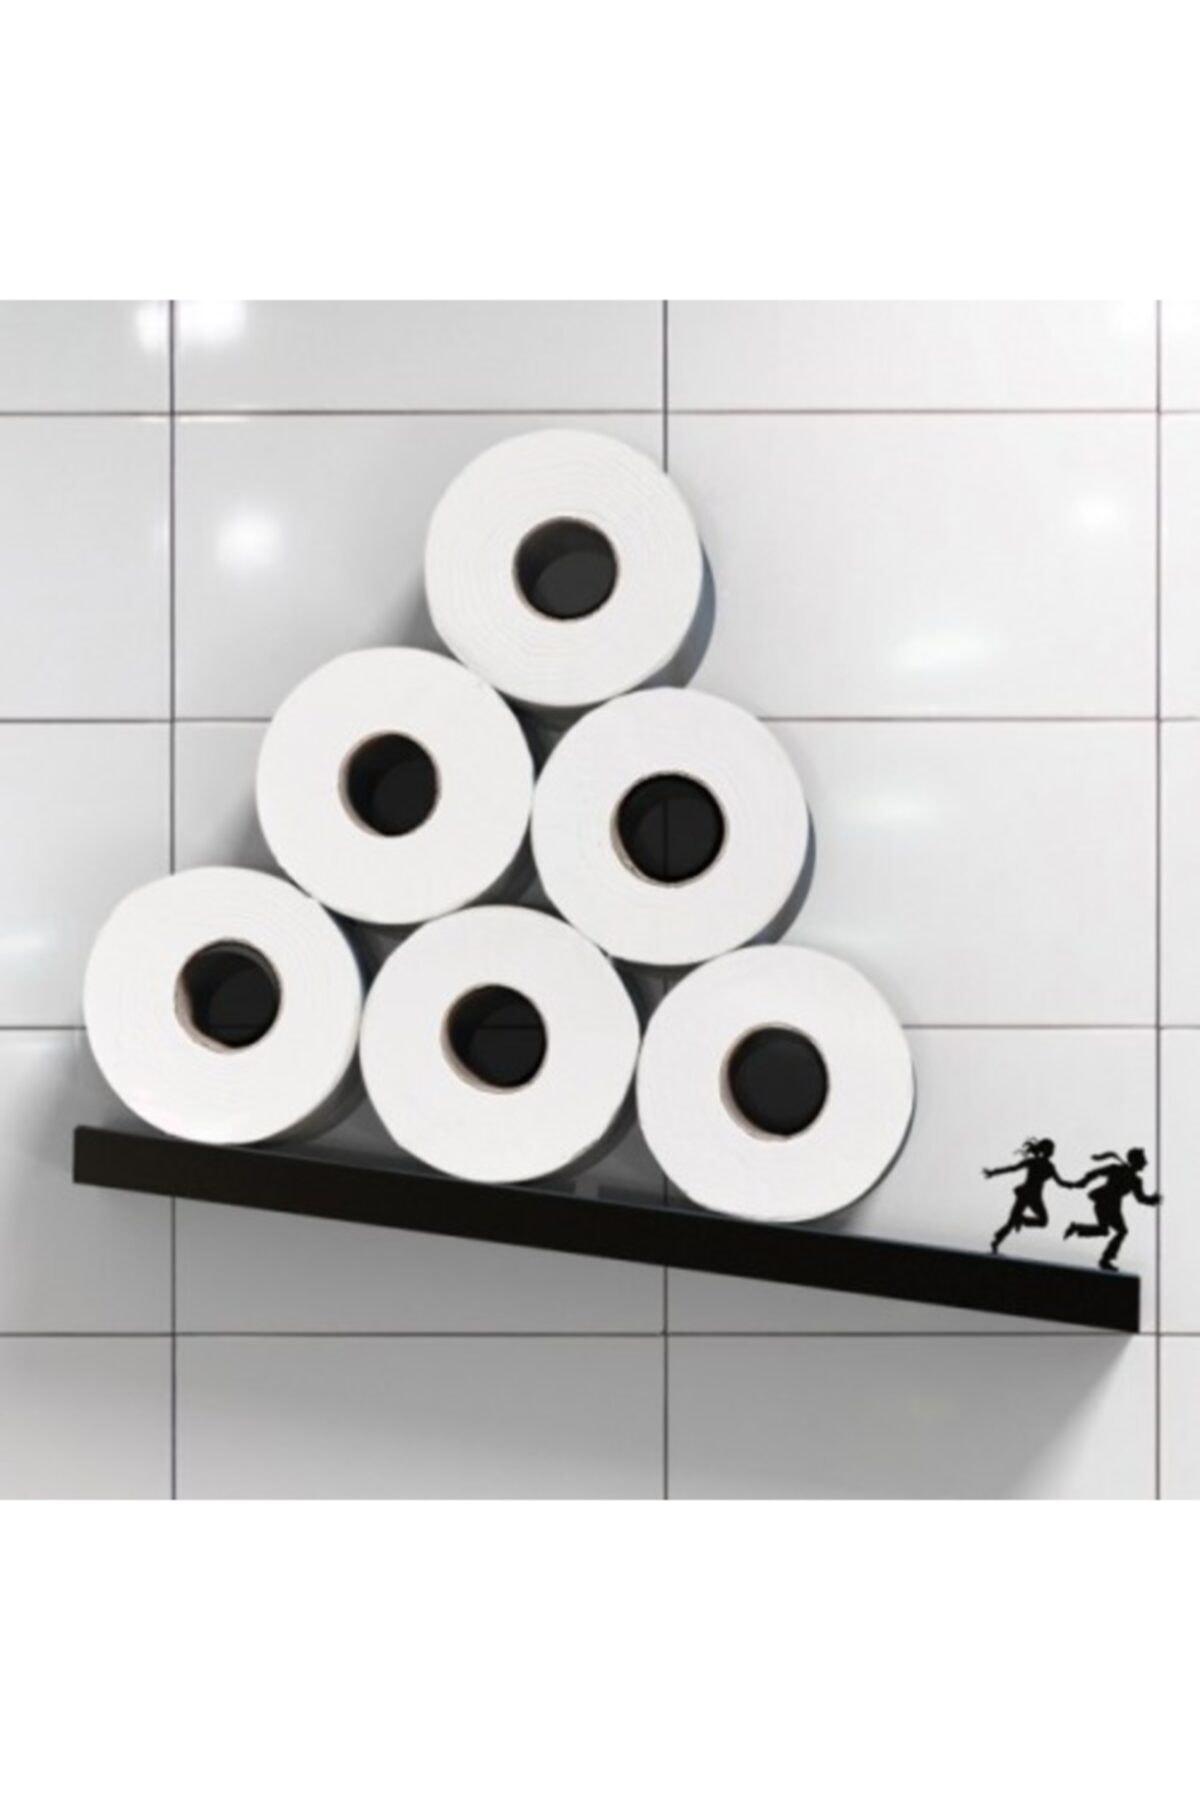 bluecape Koşan Çift Figürlü Ahşap Demir Wc Banyo Rulo Peçete Tuvalet Kağıdı Standı Rafı Kampanyalı 2